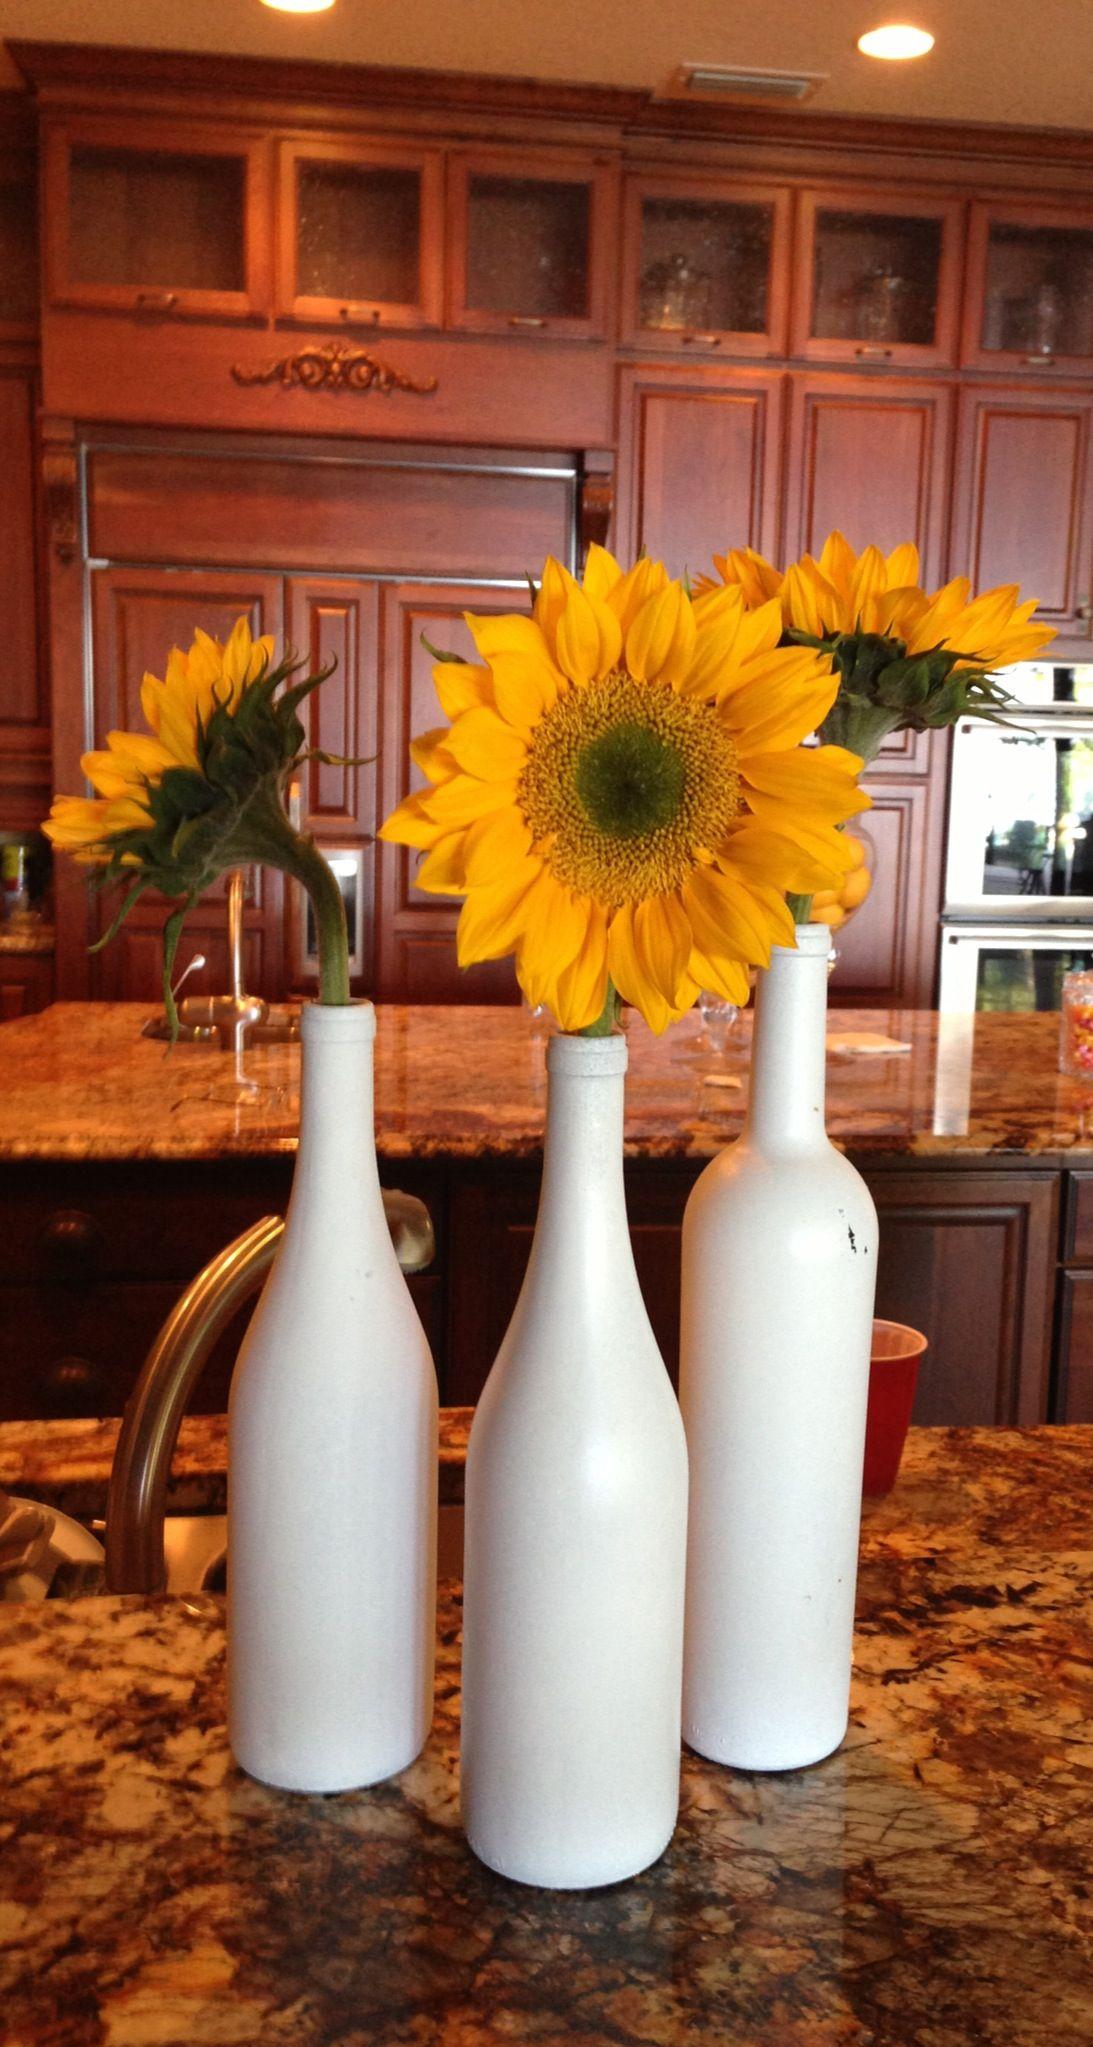 Wine bottles centerpieces | Wine bottle centerpieces, Wedding centerpieces  diy wine bottles, Bottle centerpieces